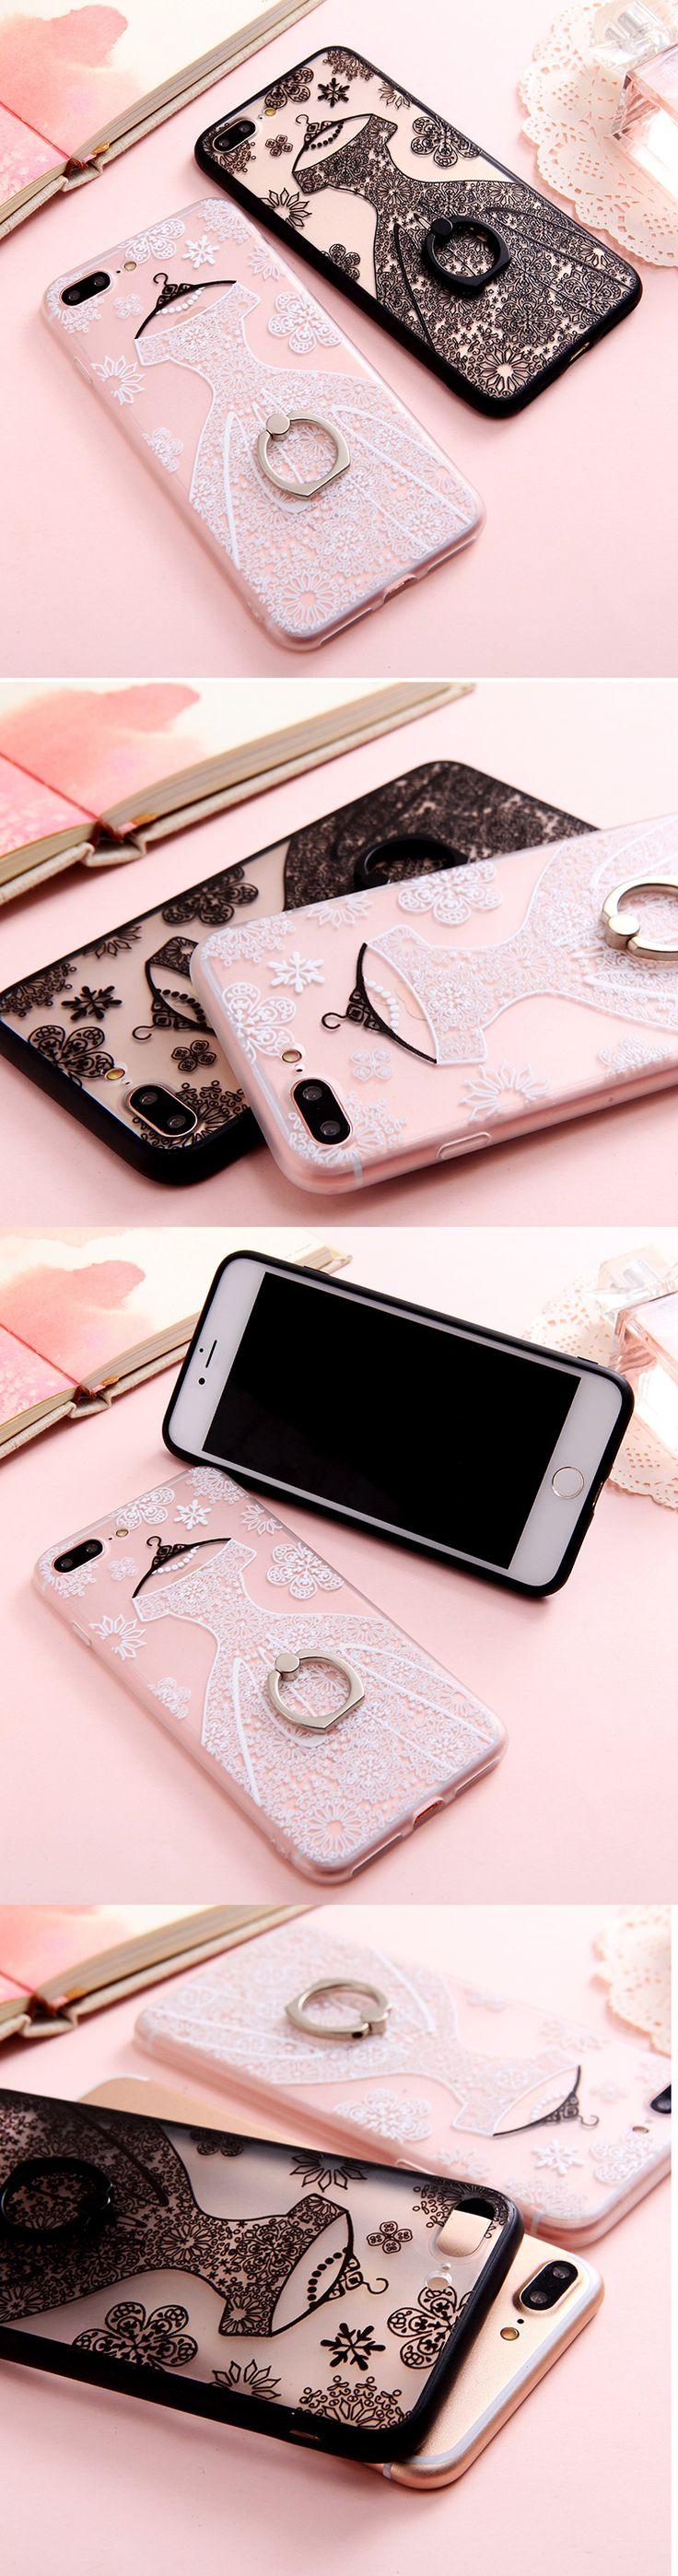 Black & White Ring Dress iPhone Case